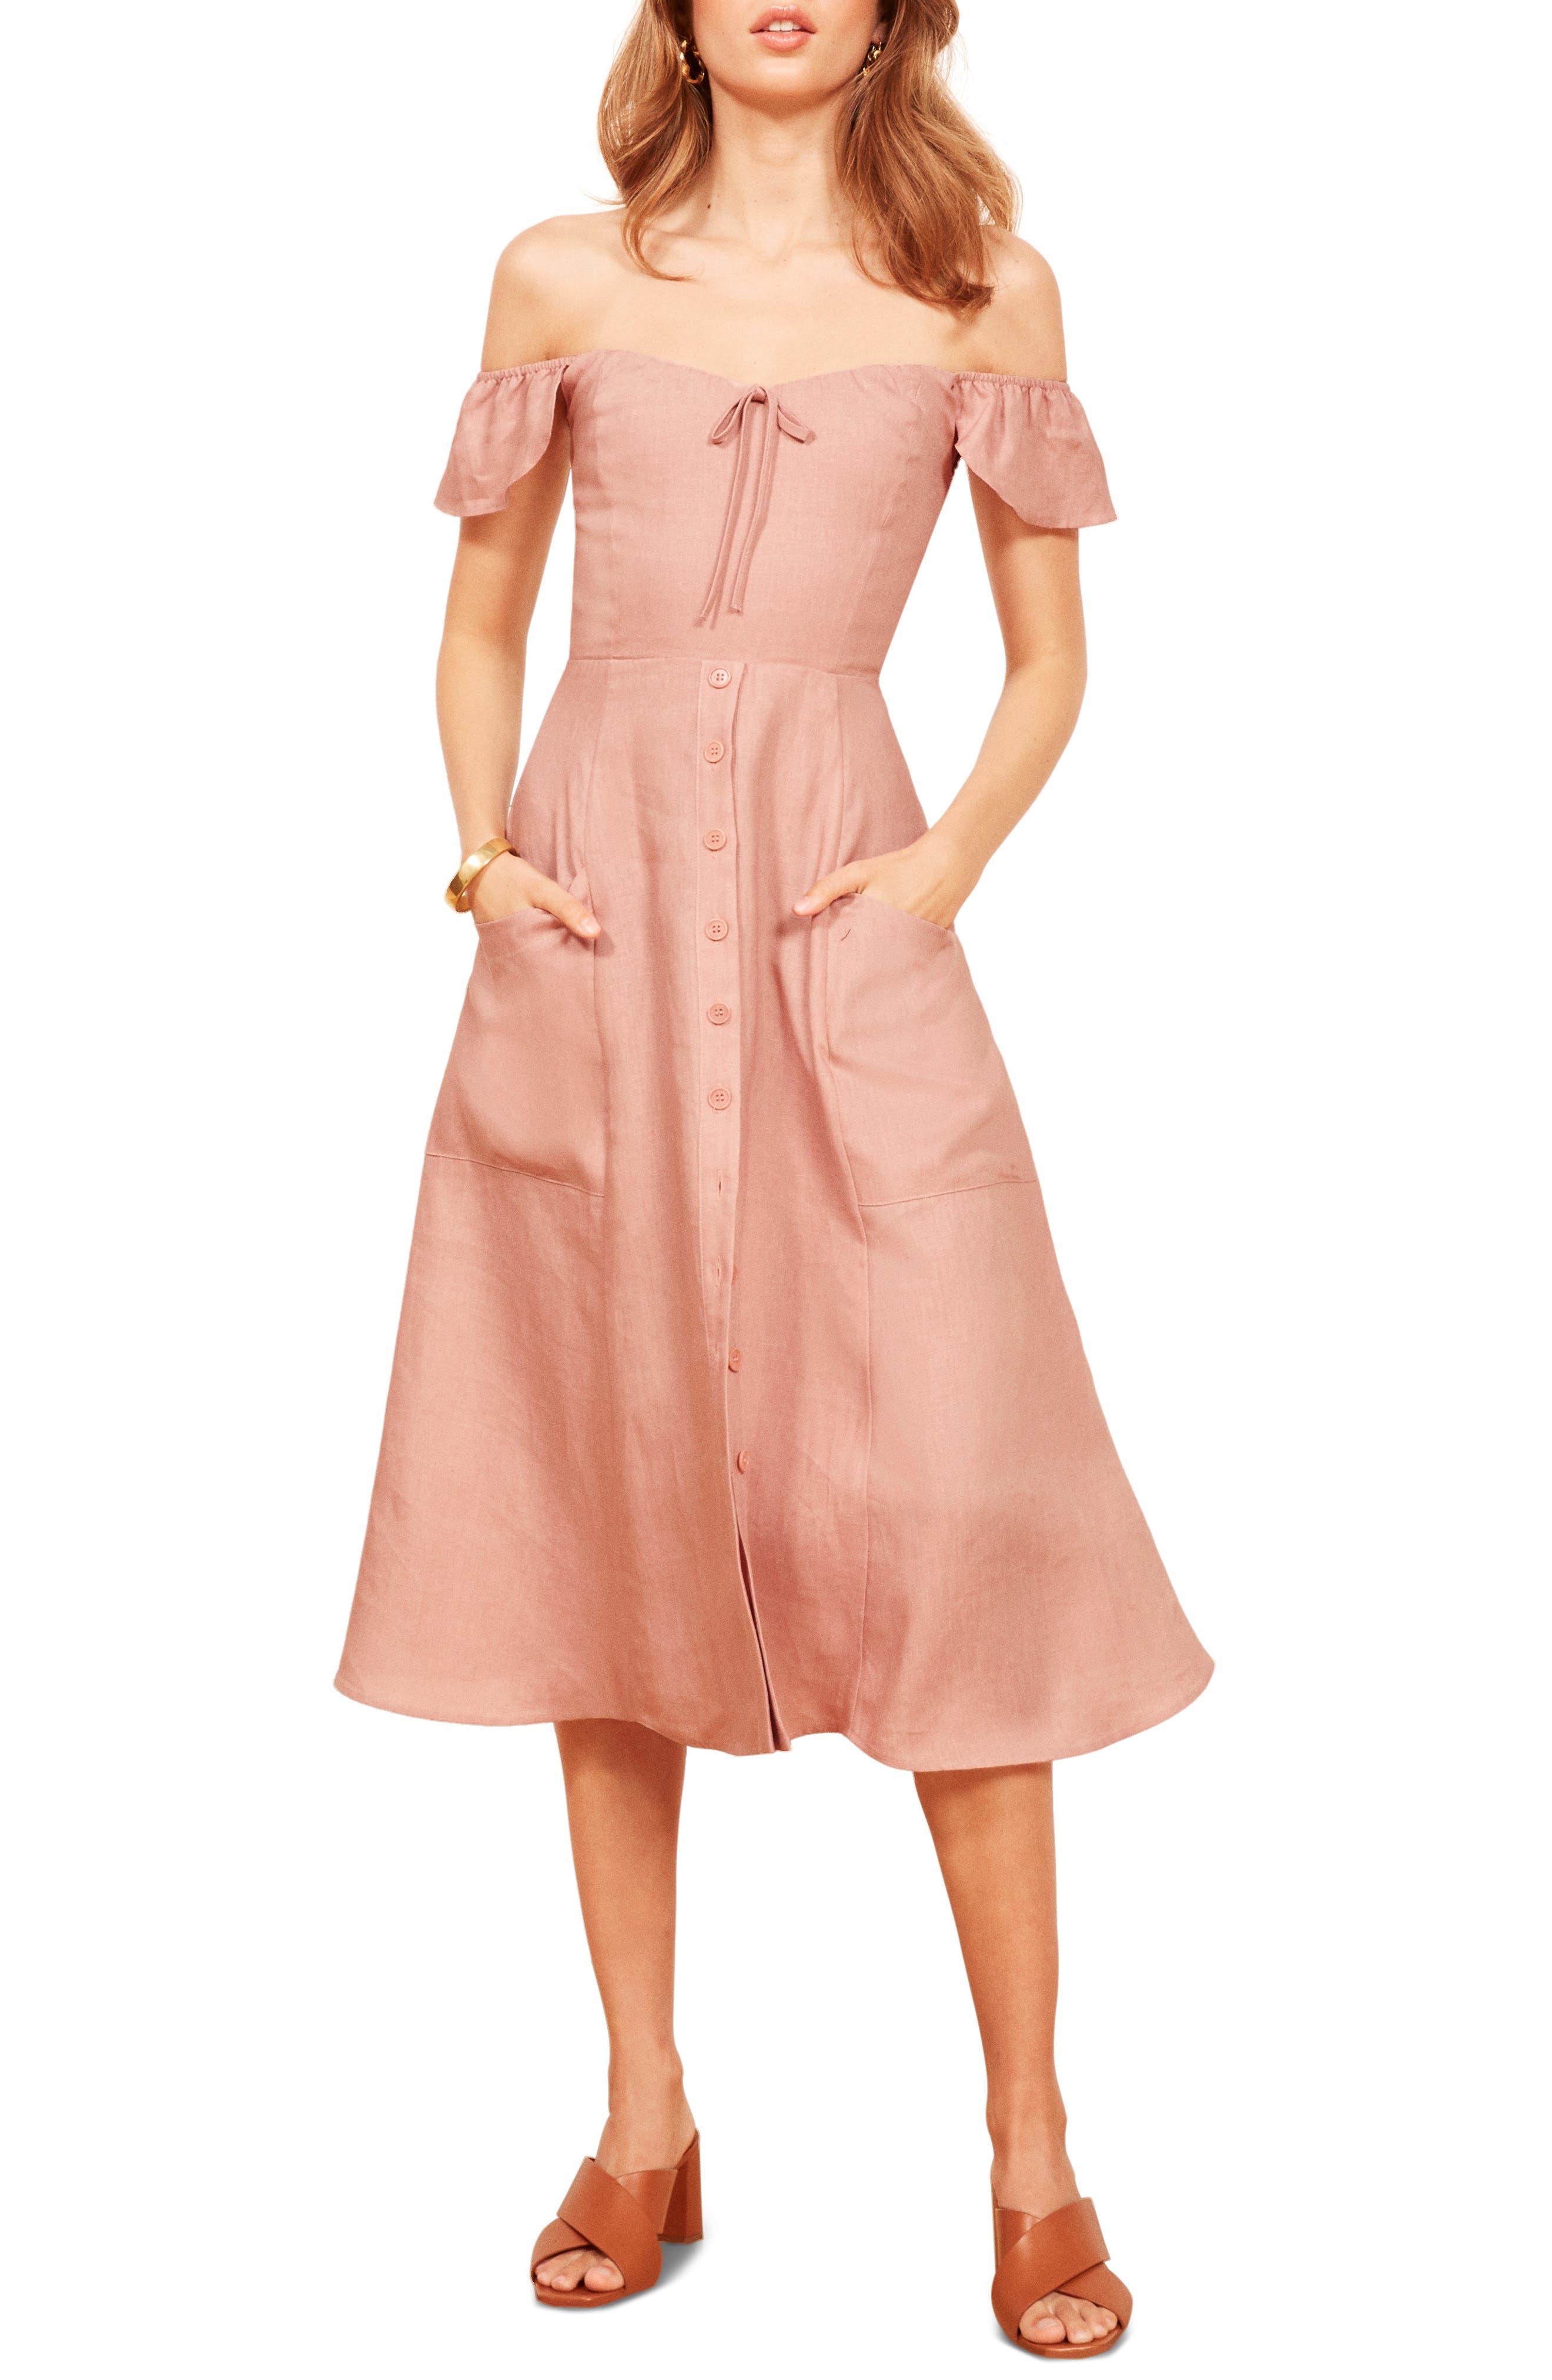 Francis Prairie A-Line Dress,                             Main thumbnail 1, color,                             650